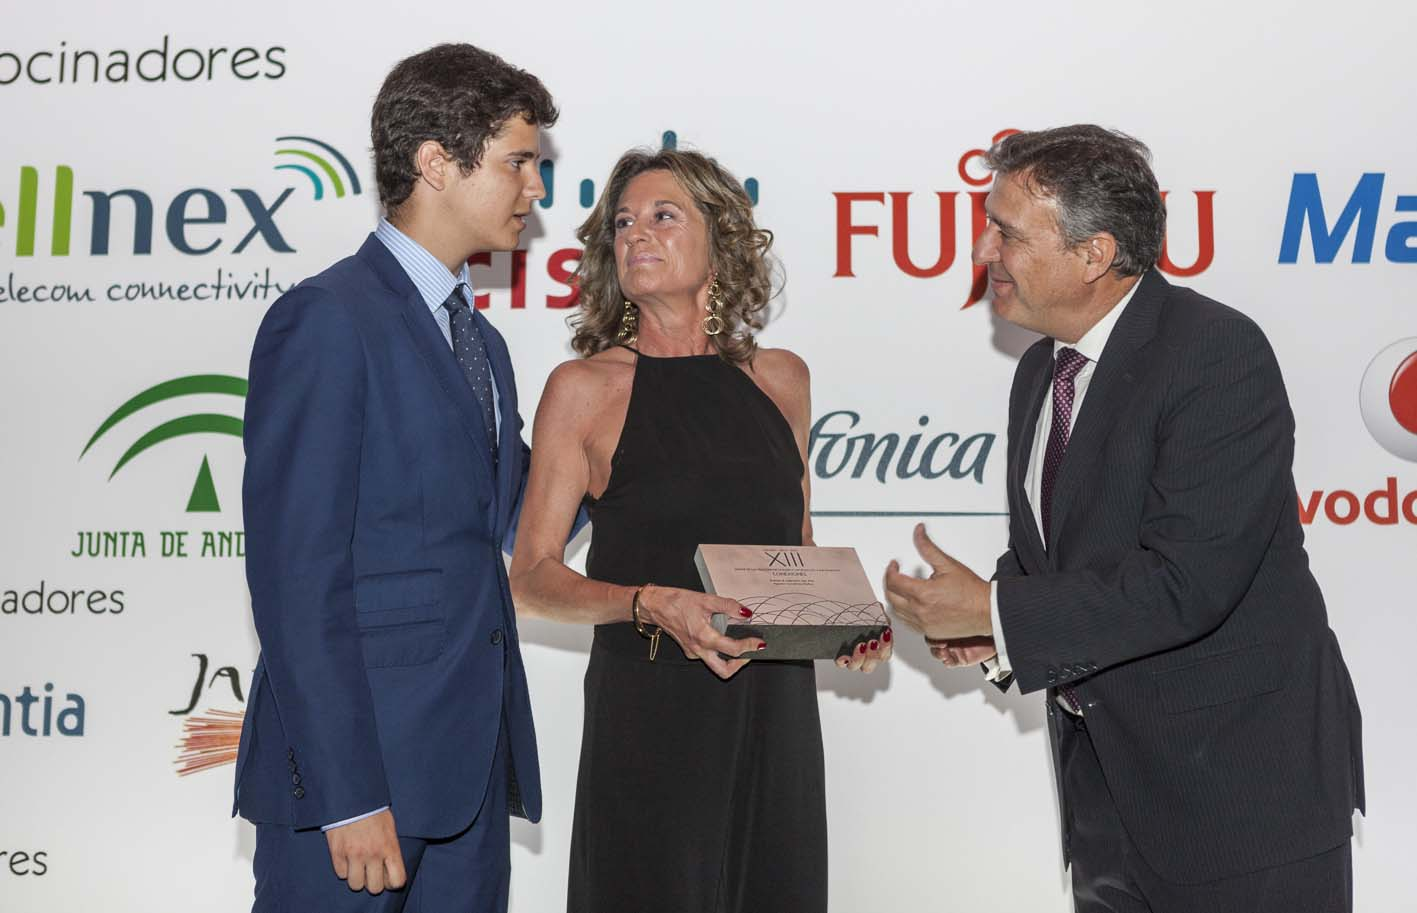 _MG_1644 Arteaga entrega Premio Ingeniero del Año